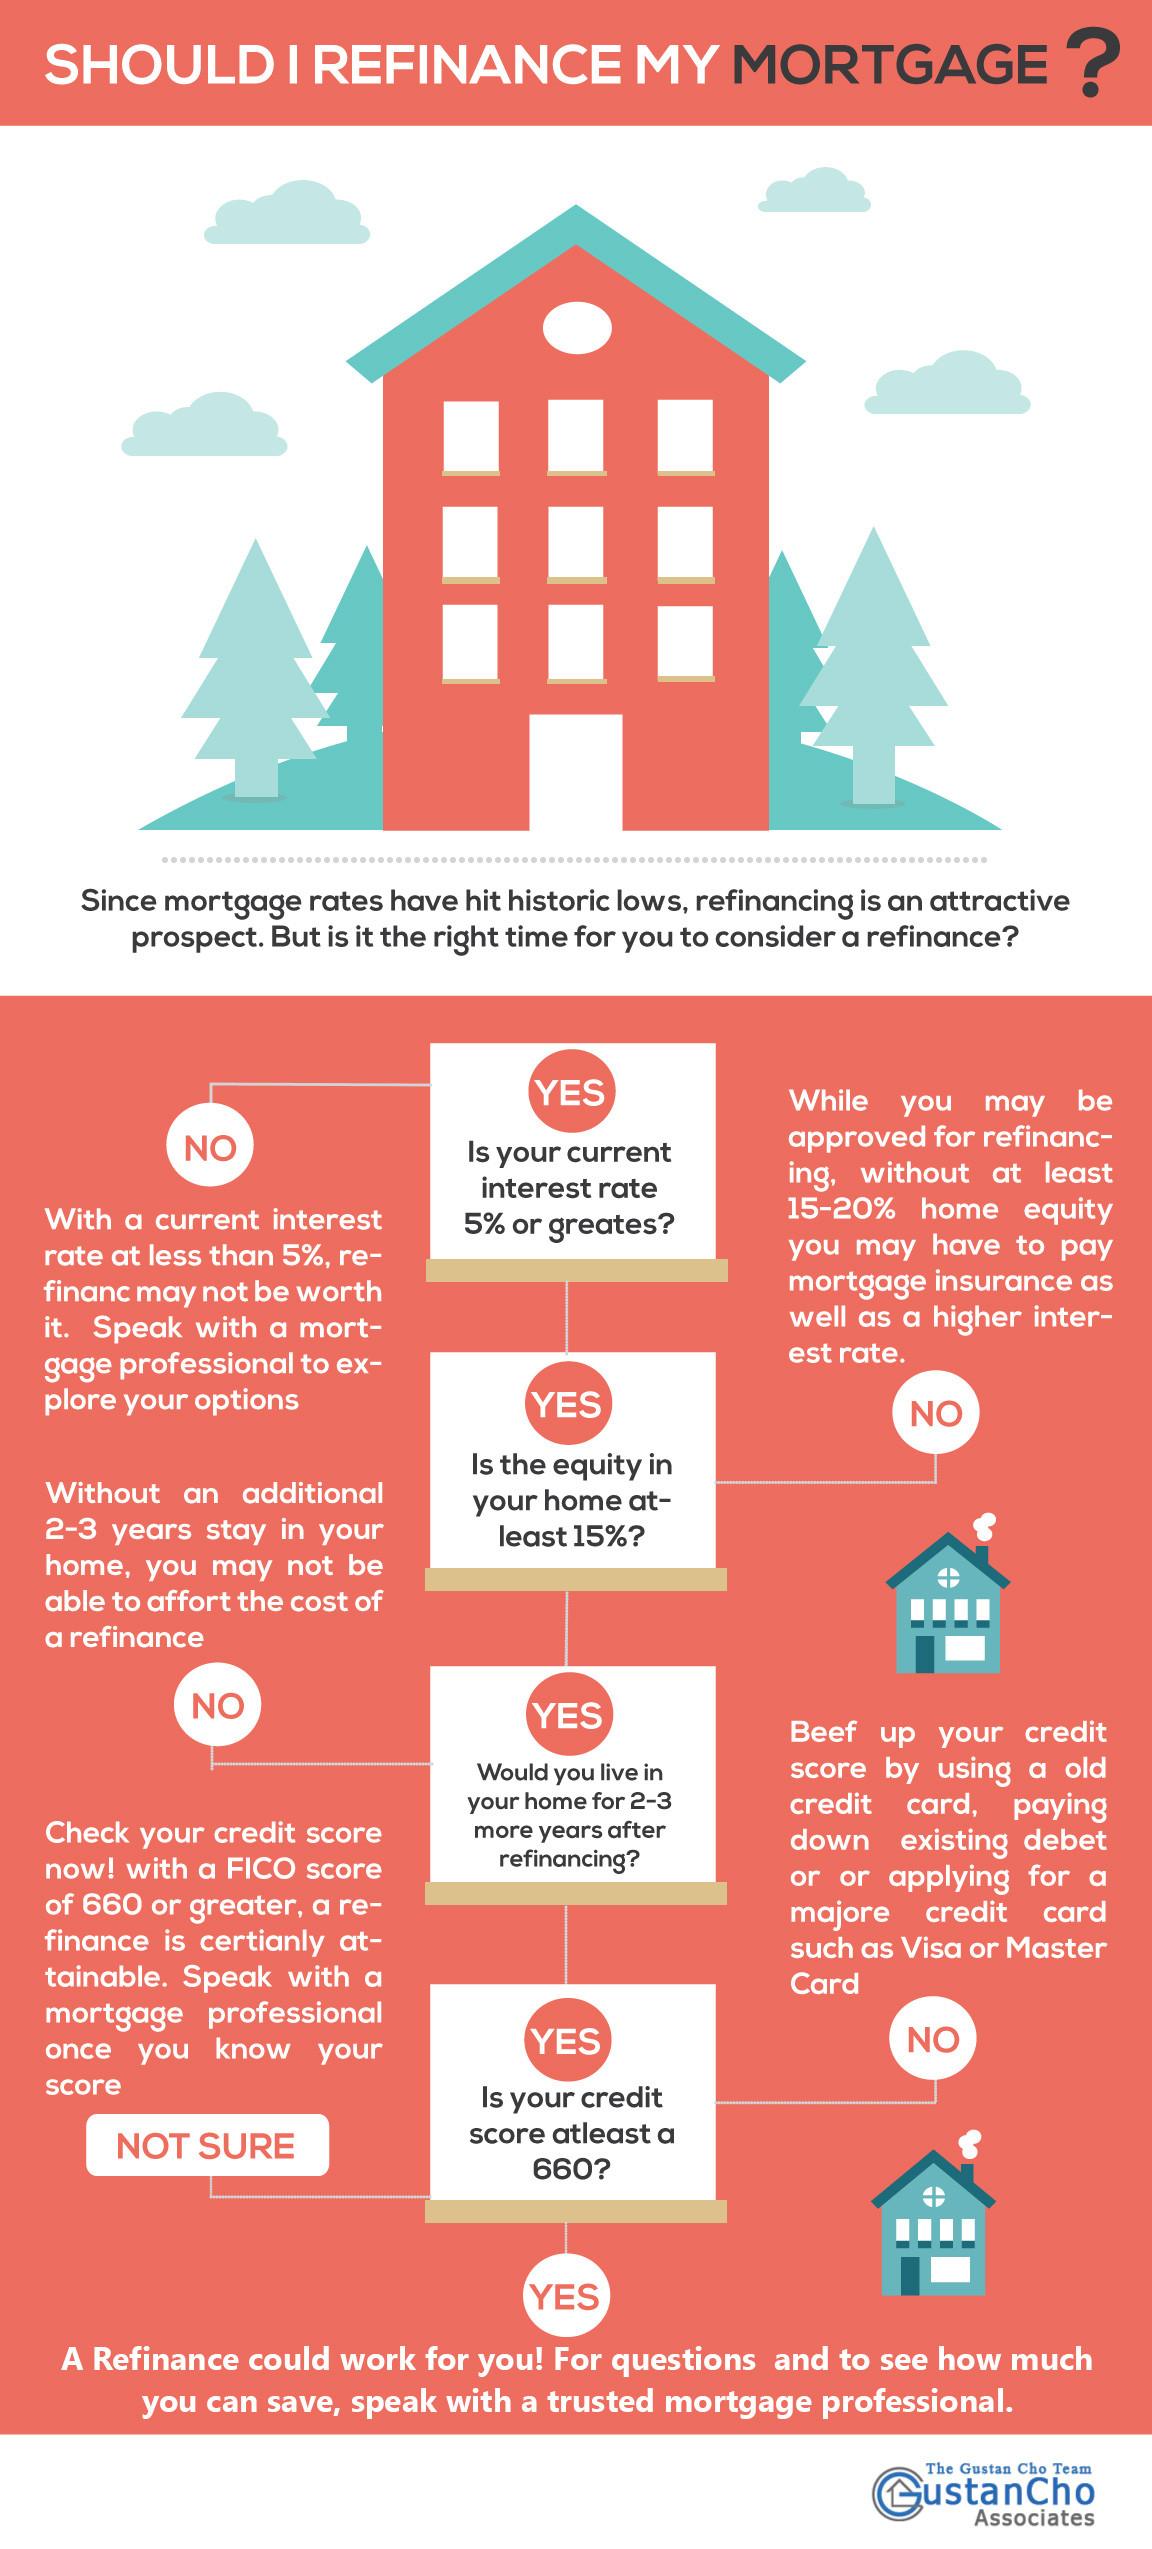 Florida Refinance Mortgage Loans